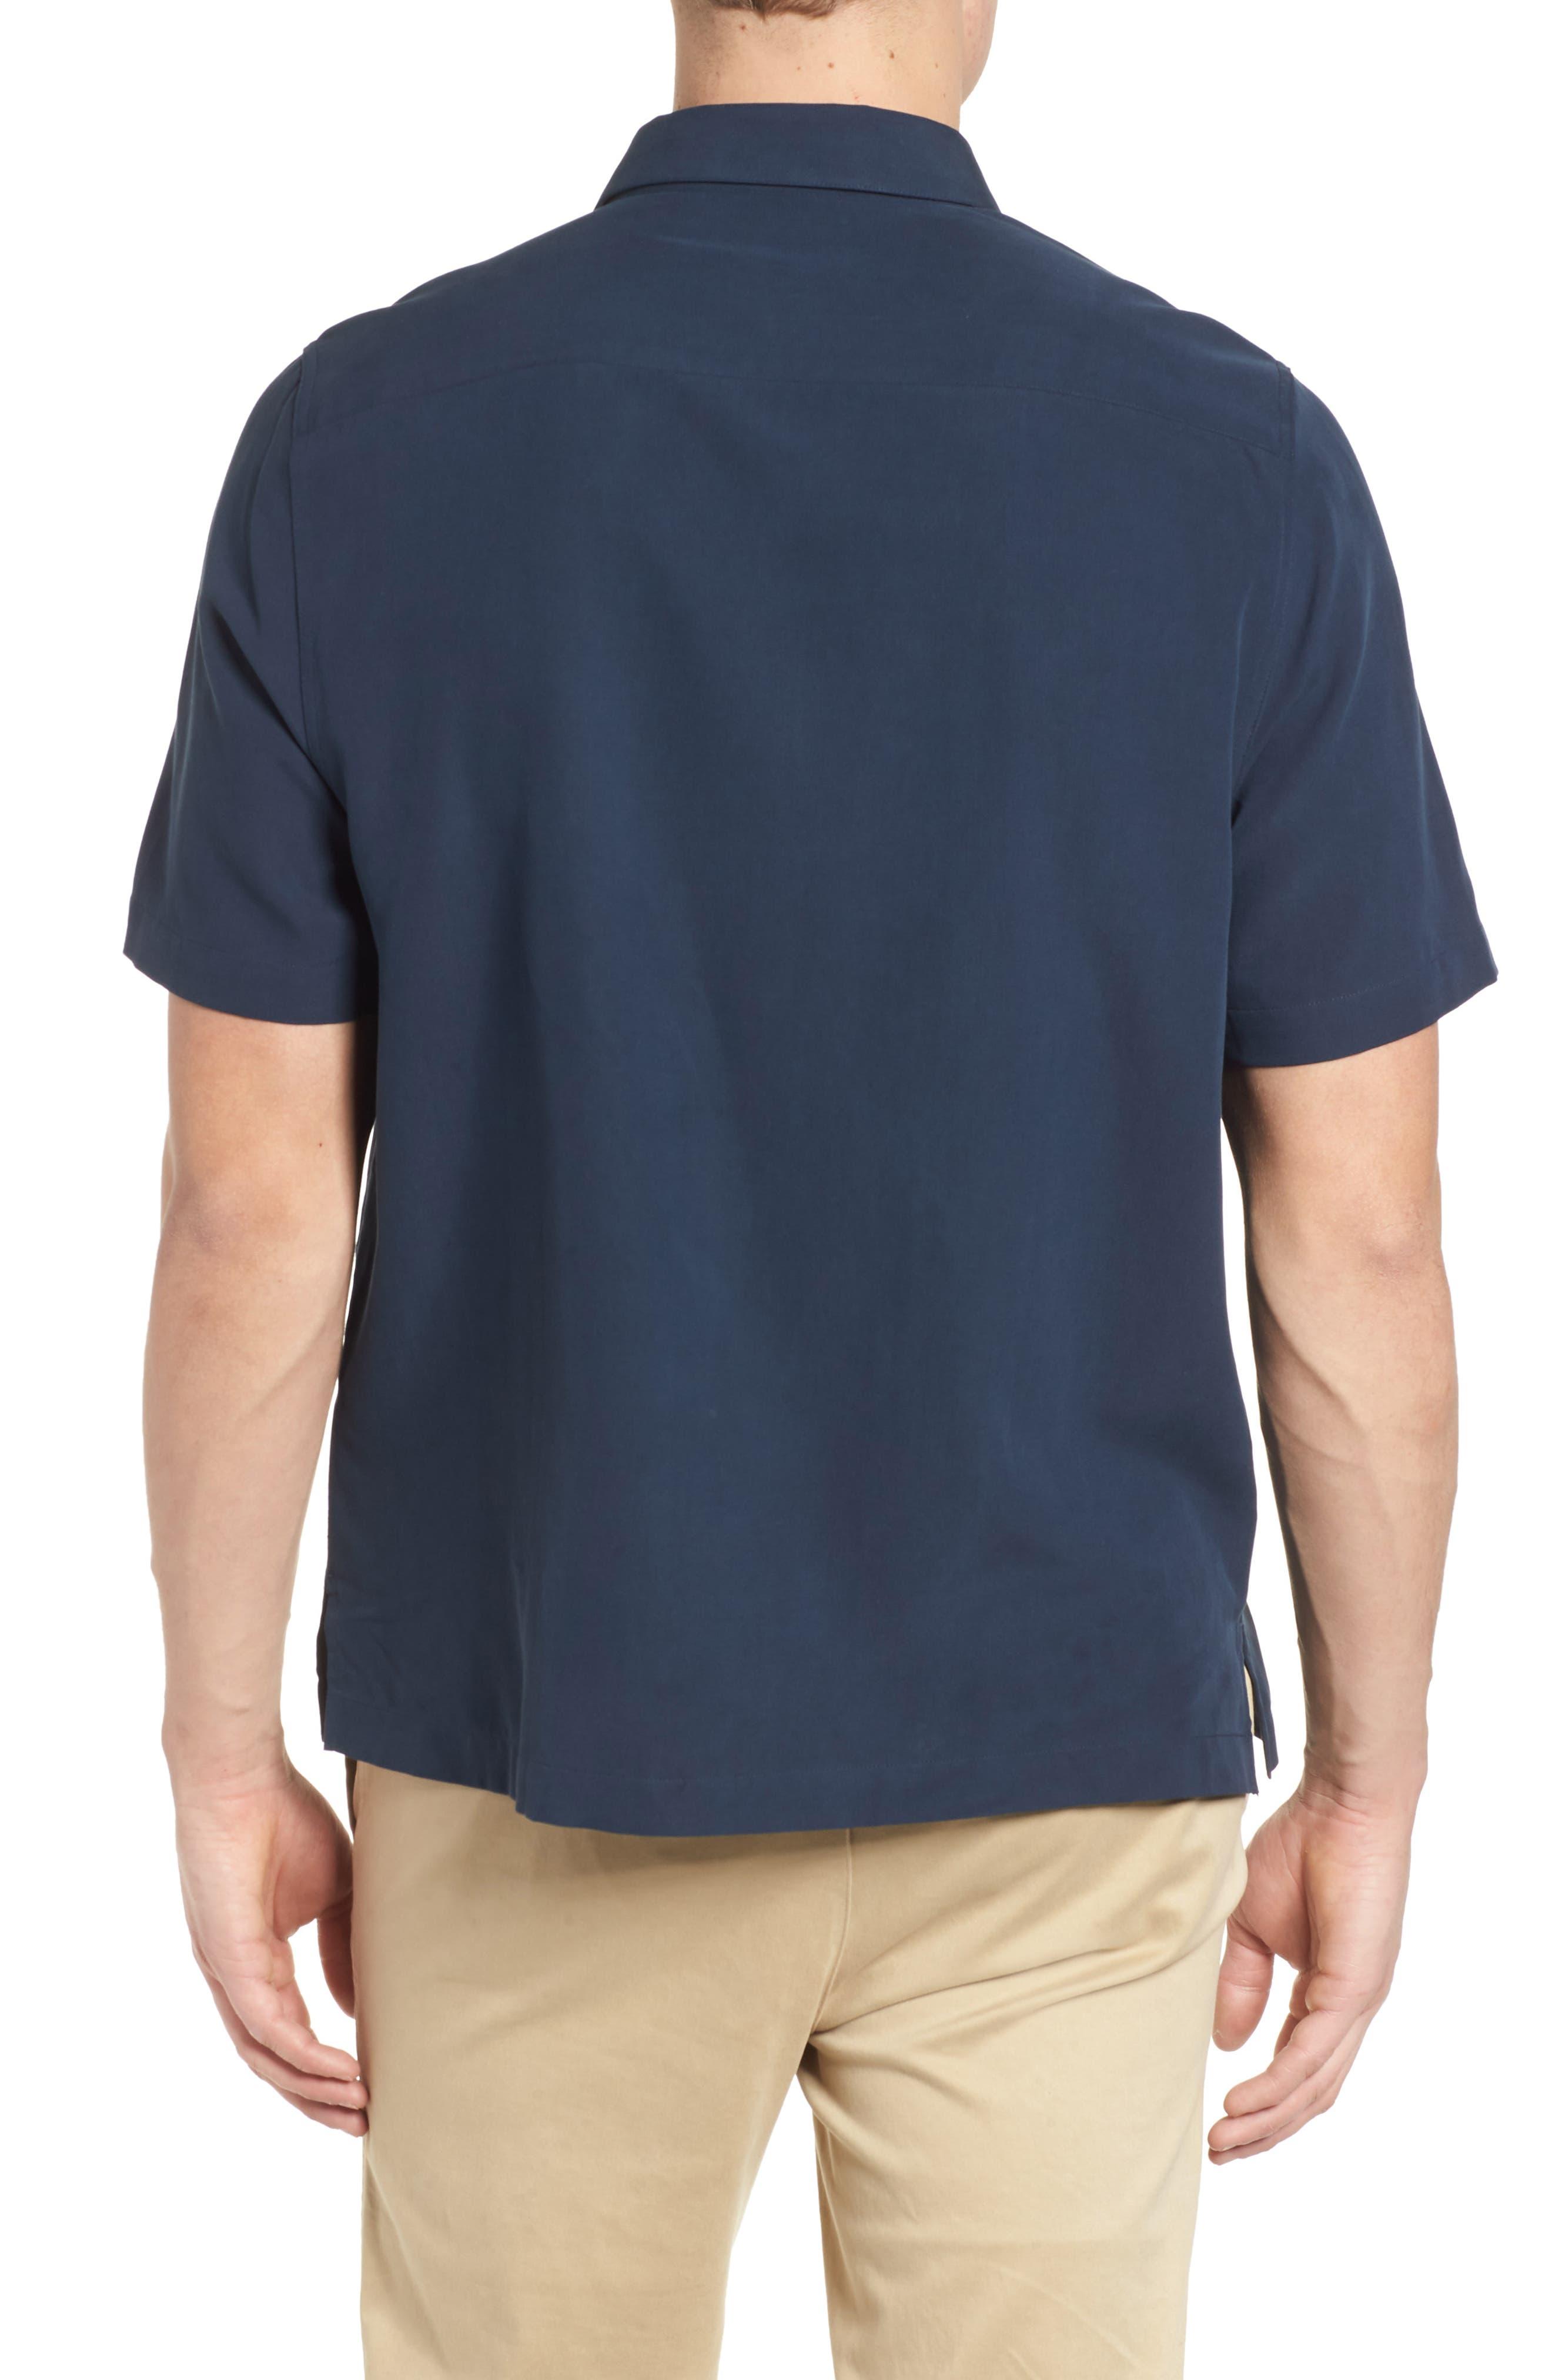 Key Best Camp Shirt,                             Alternate thumbnail 2, color,                             Midnight